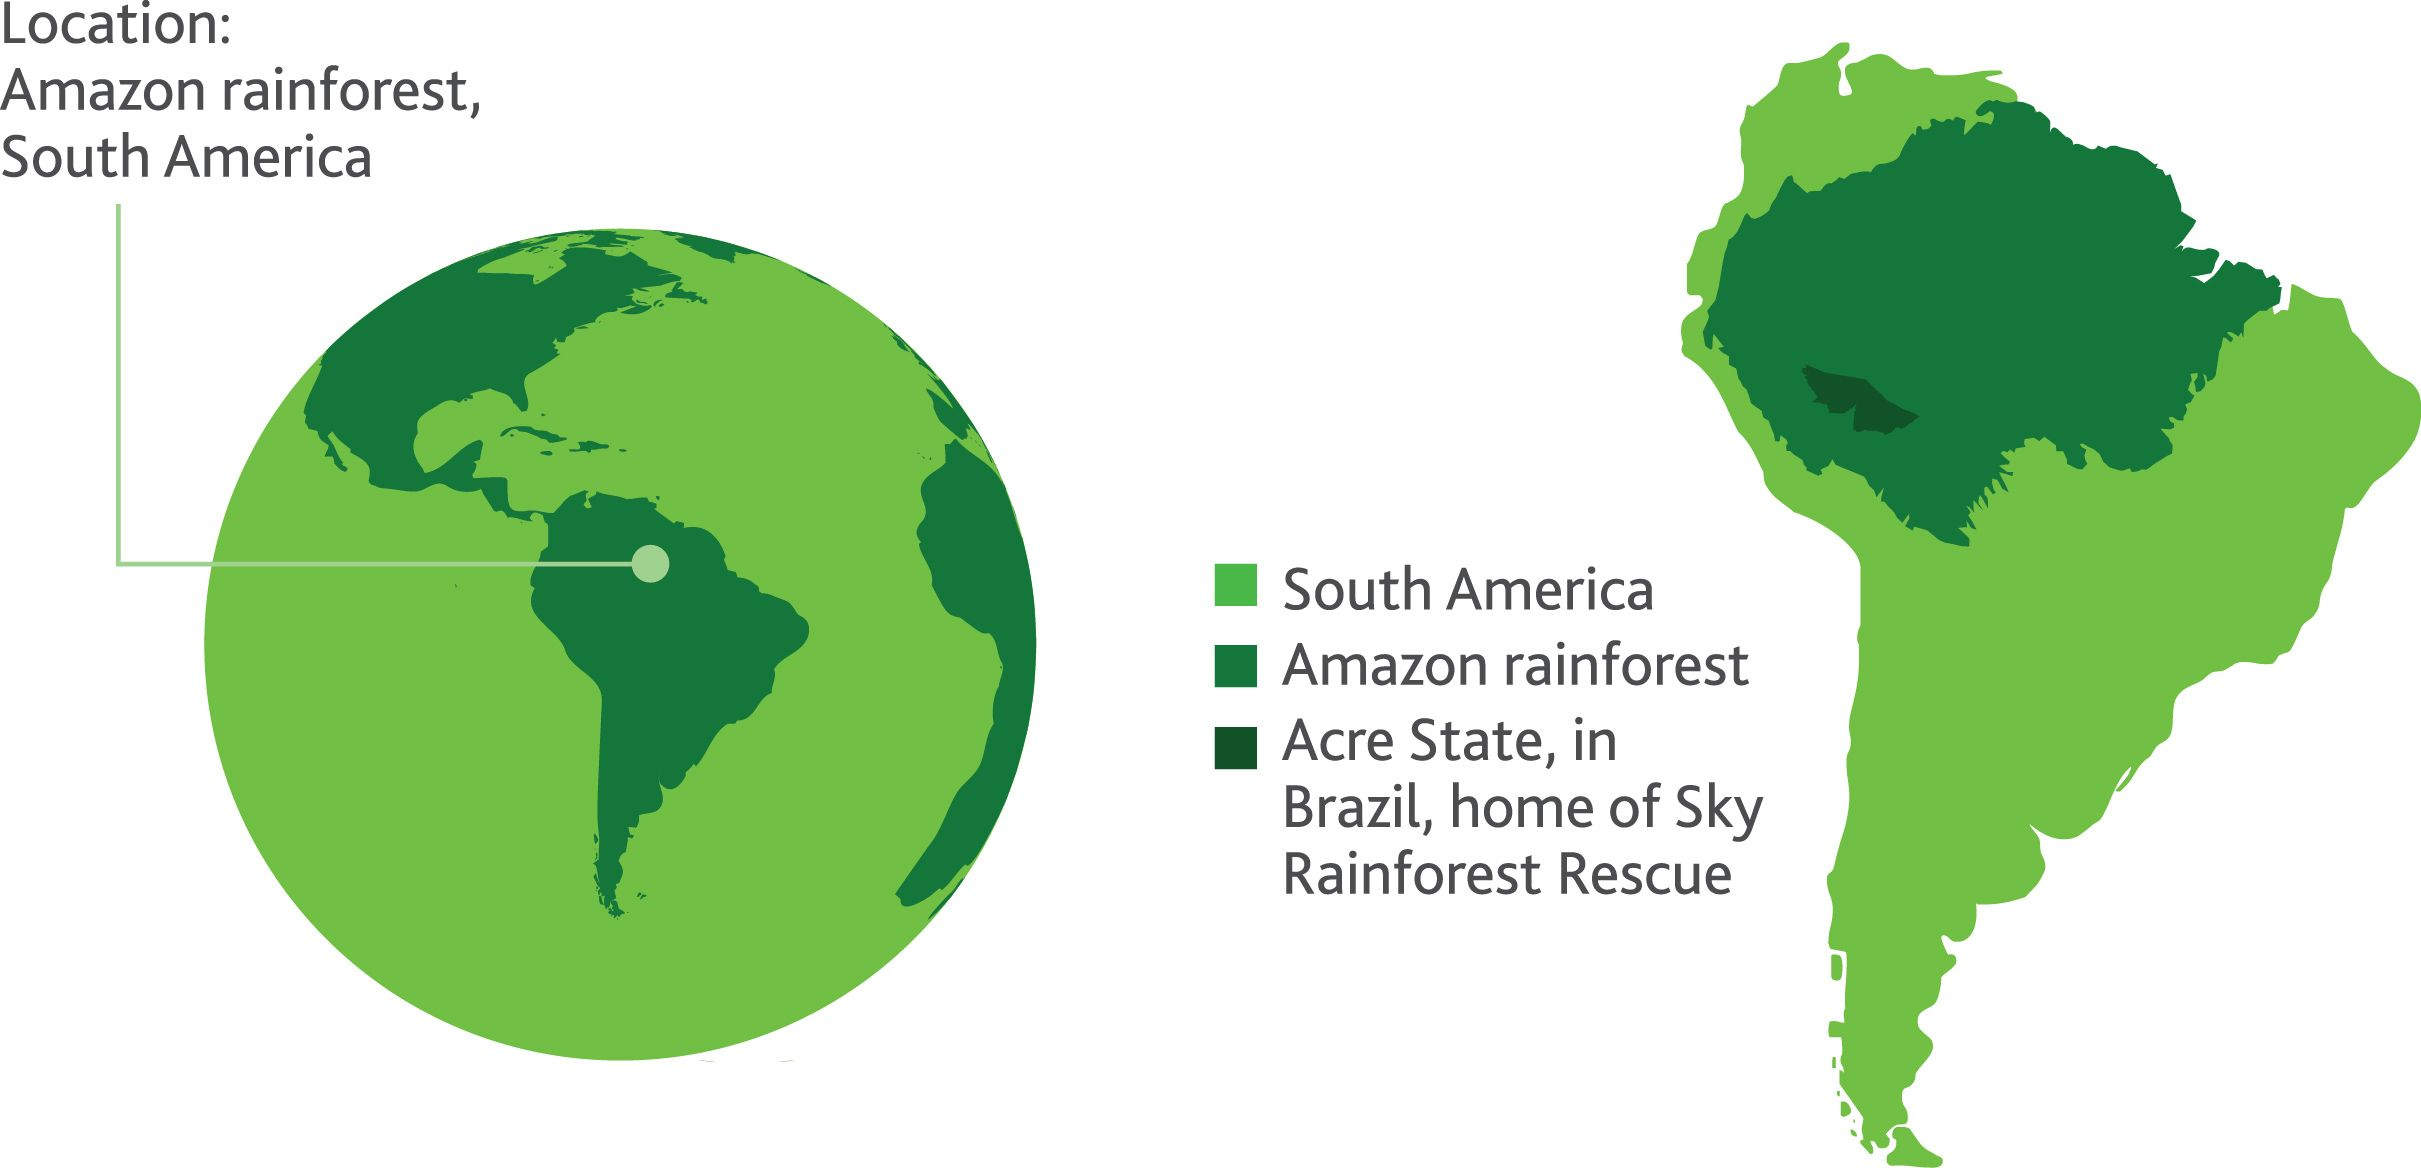 amazon rainforest map Google Search Amazon rainforest